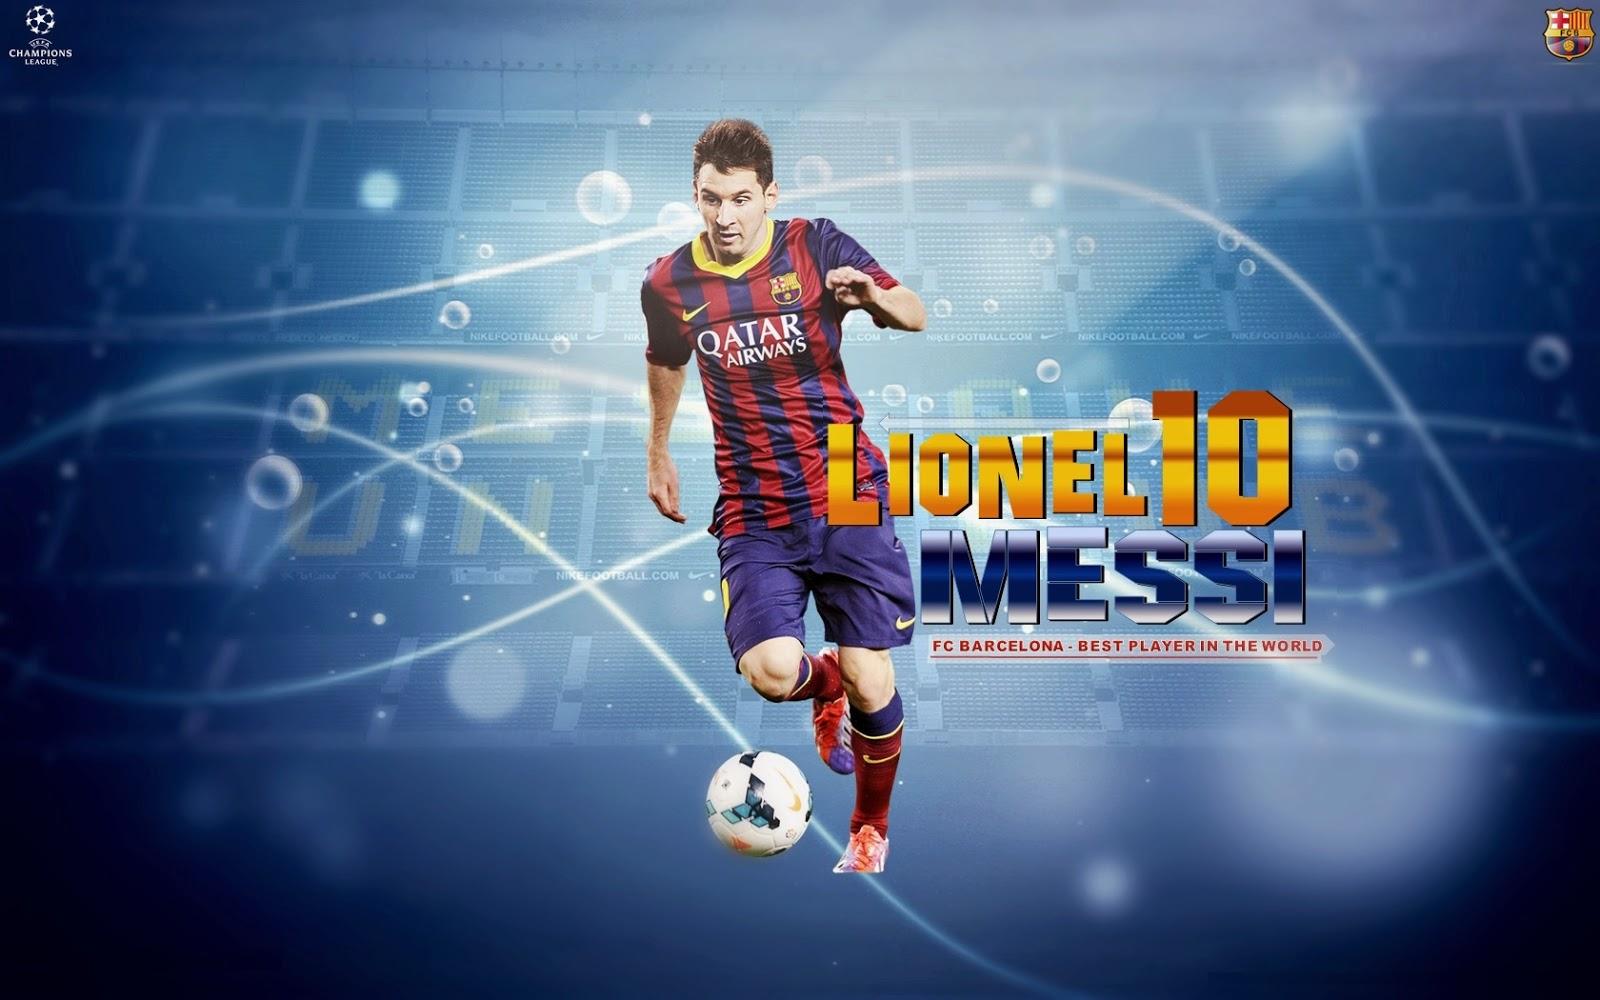 Lionel Messi Football Wallpapers Download Wallpaper Iku 1600x1000